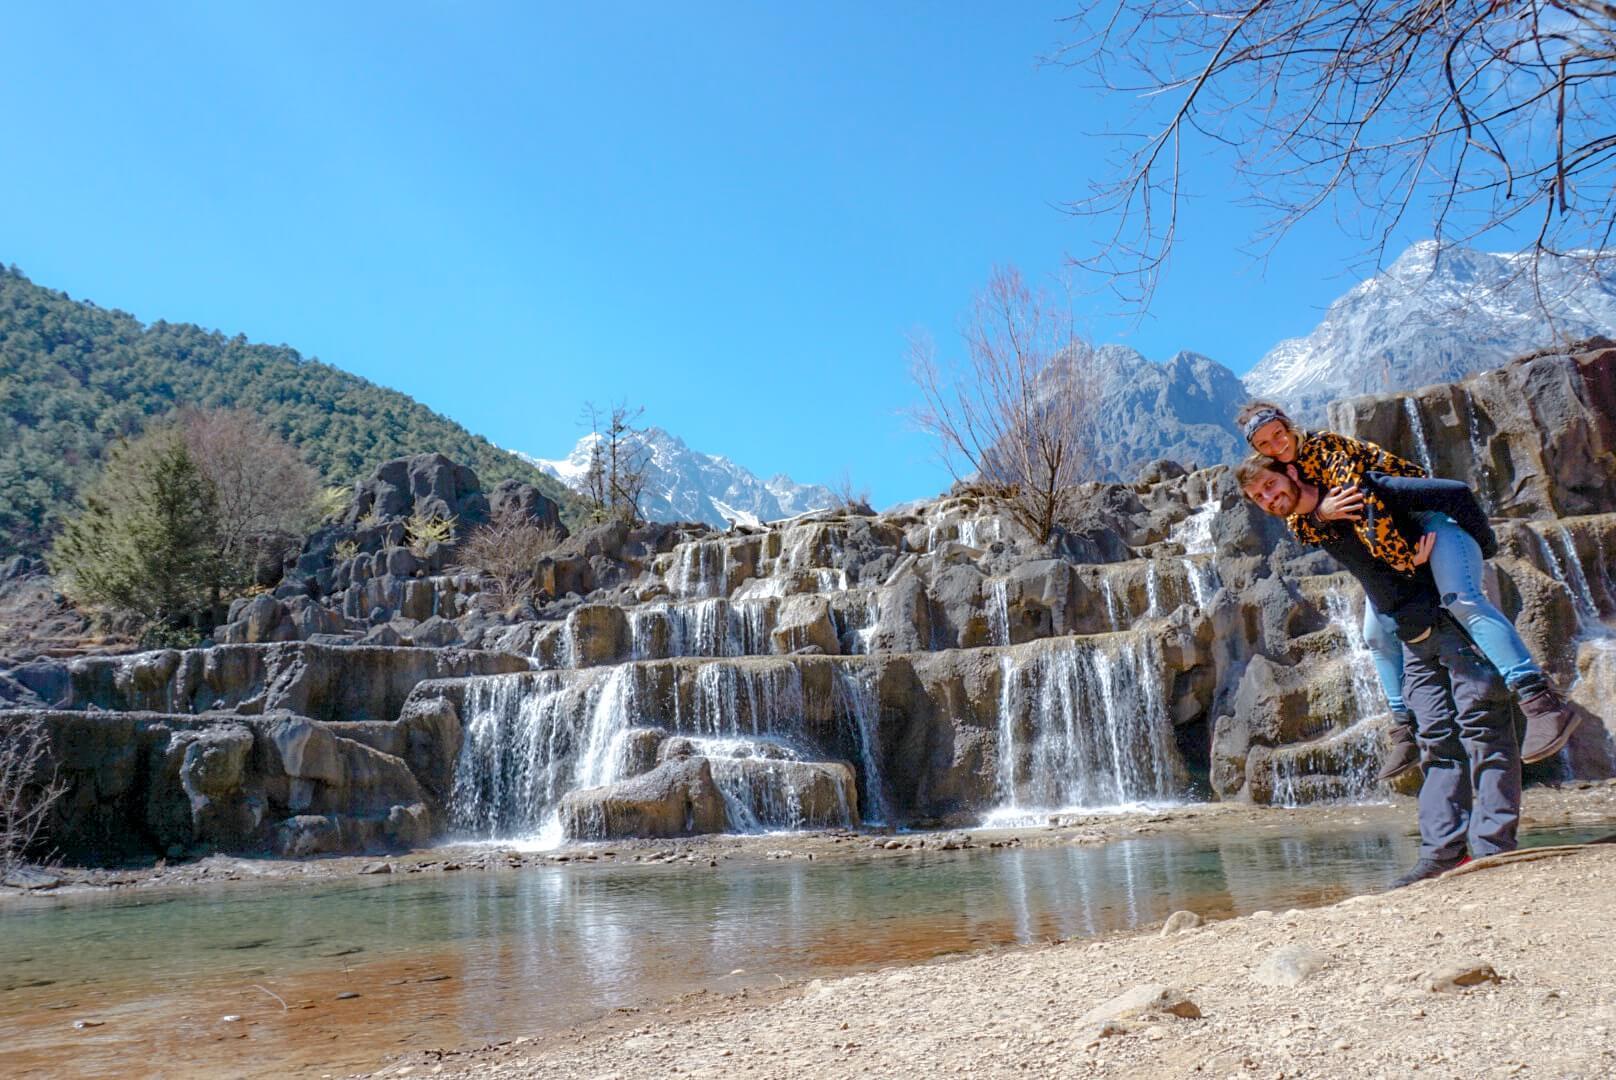 Blue moon valley Lijiang Yunnan chine montagne du dragon de jade